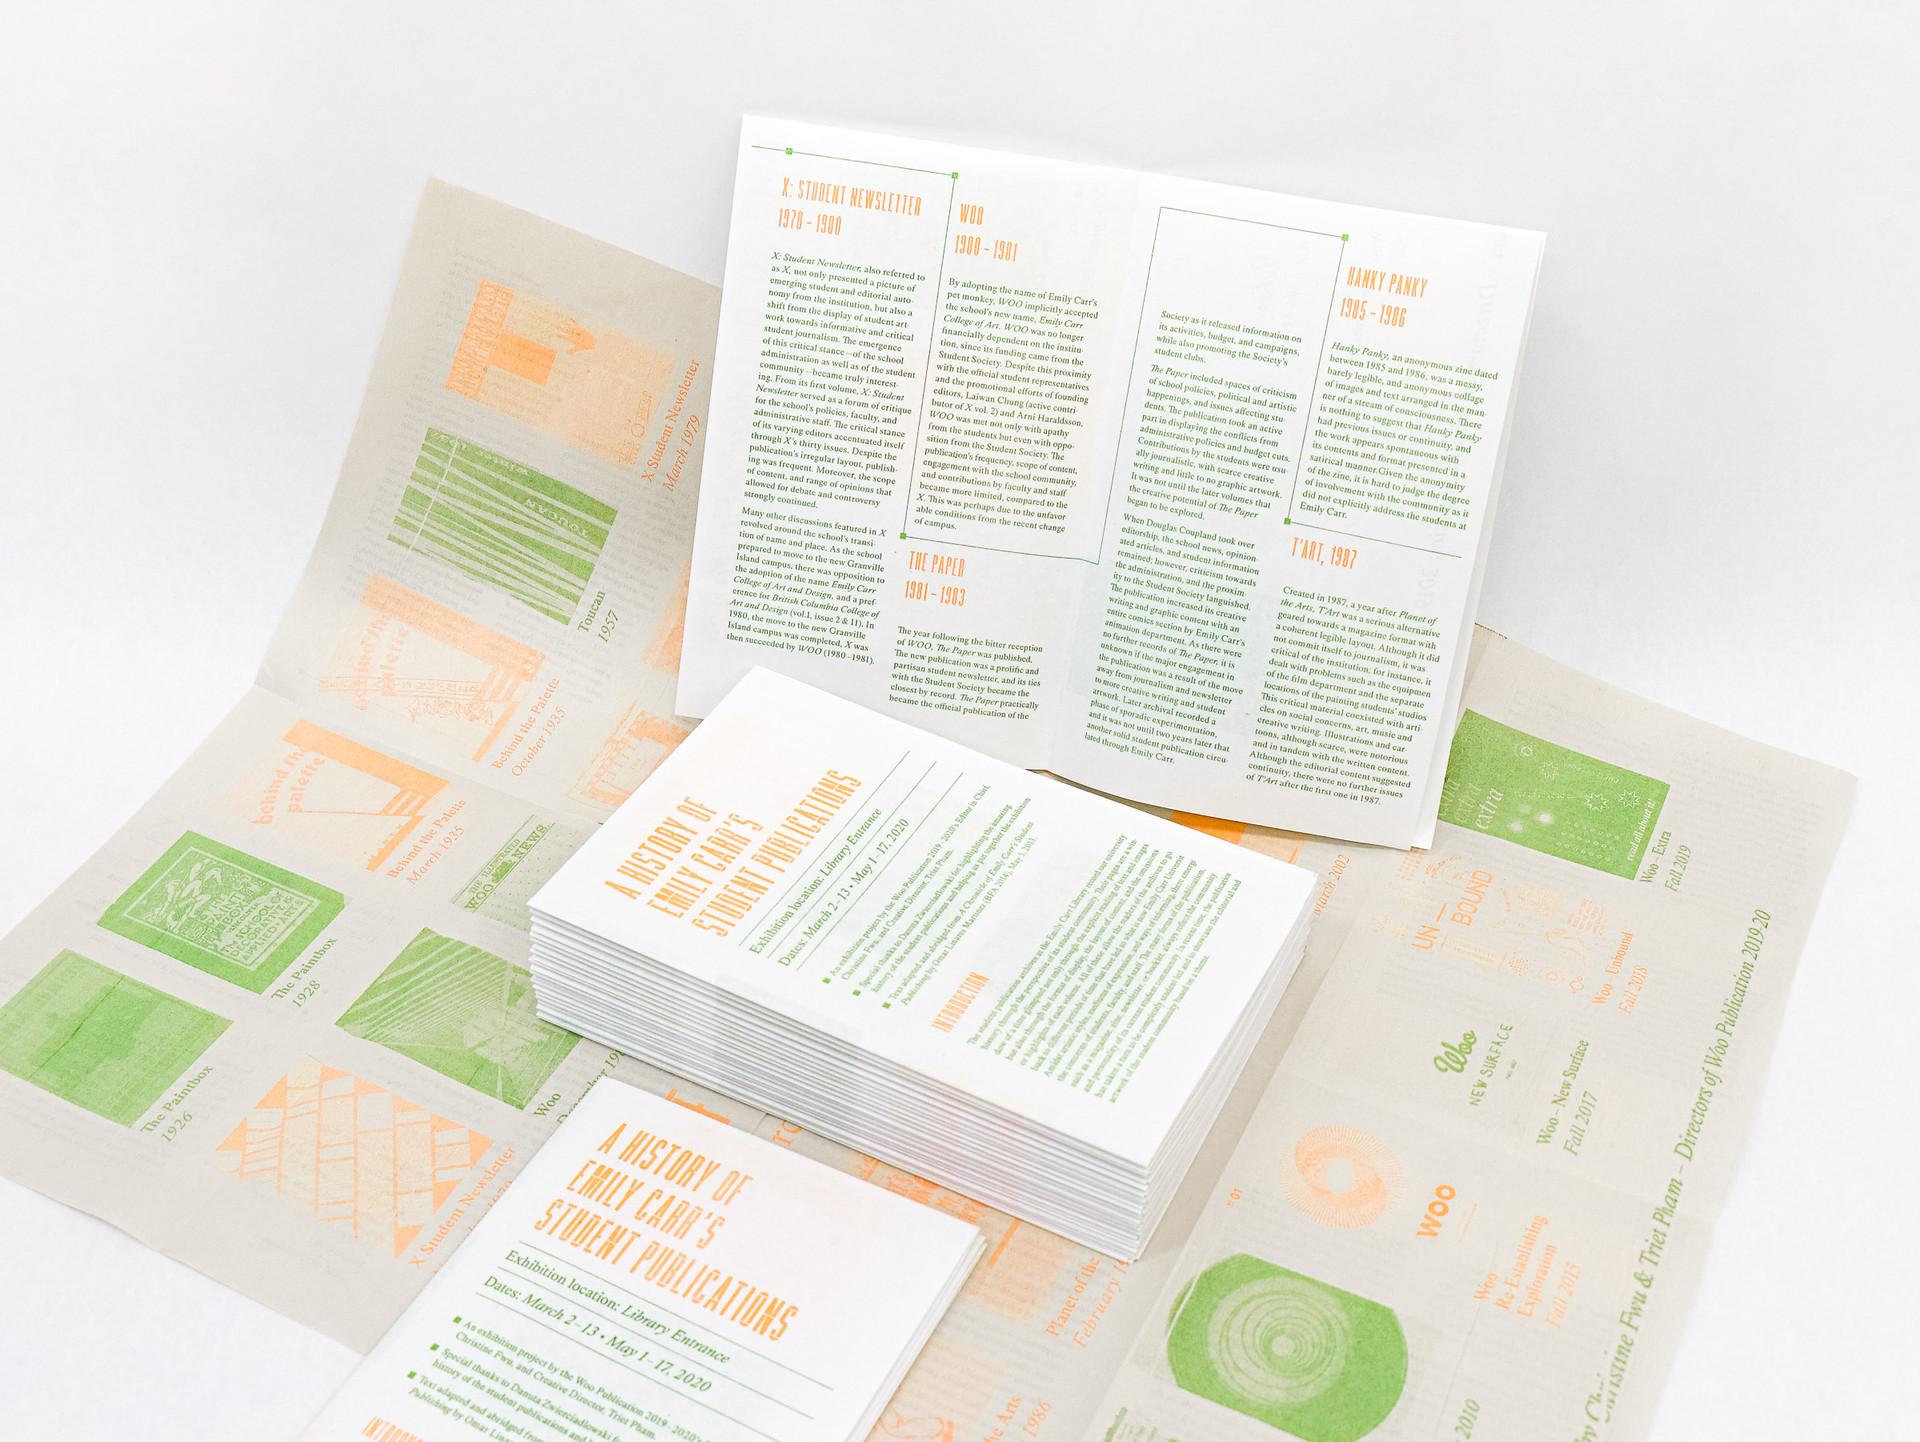 triet-pham-woo-exhibition-catalog-design